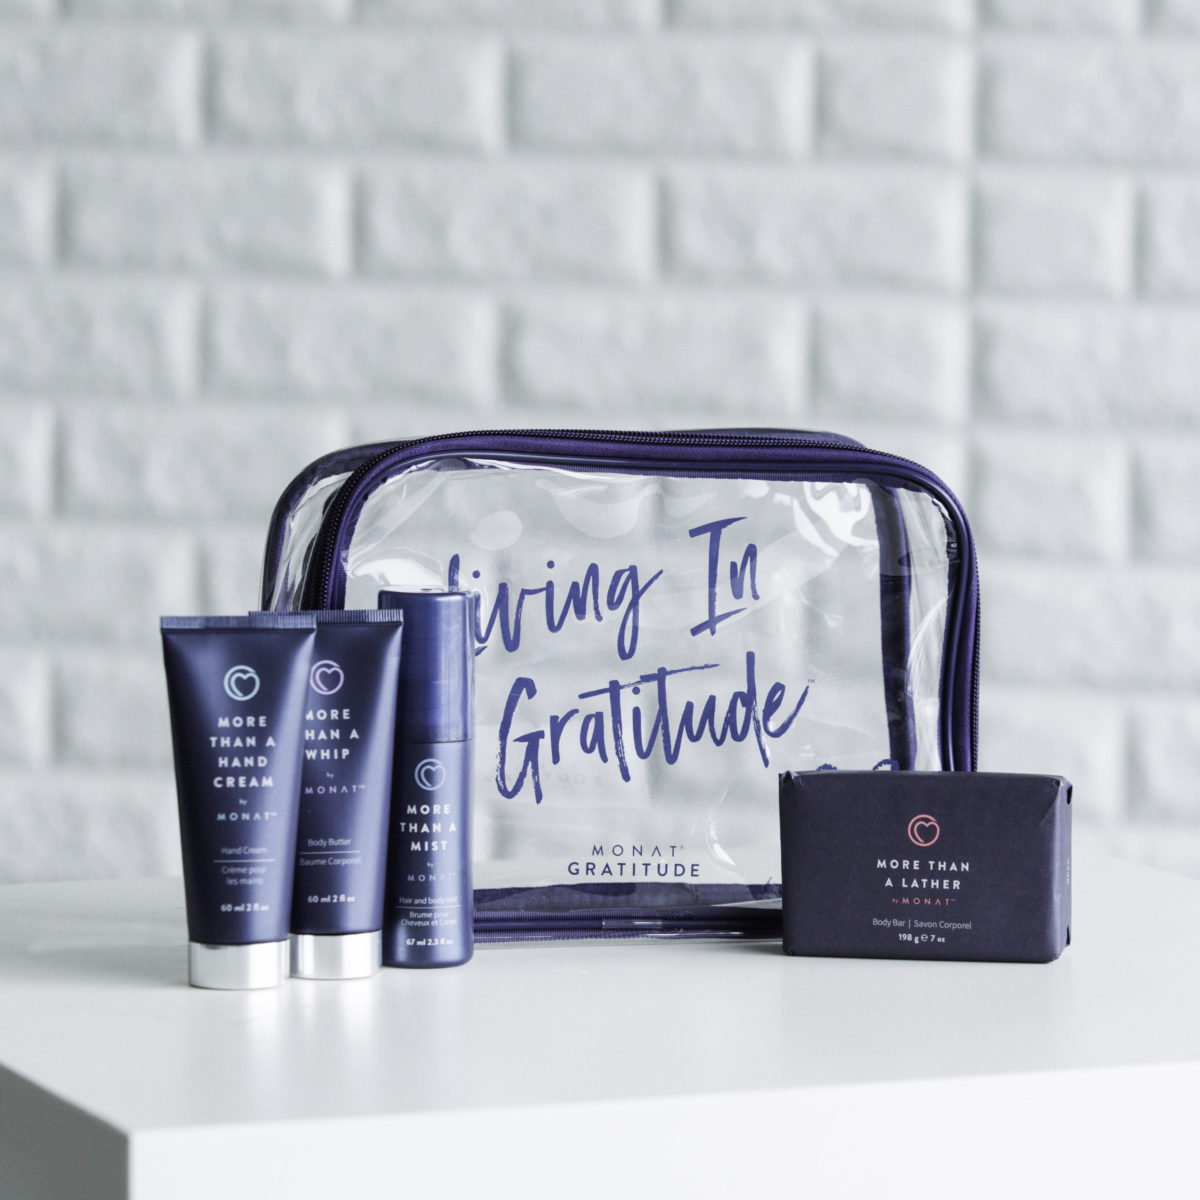 monat gratitude, living in gratitude, monat products